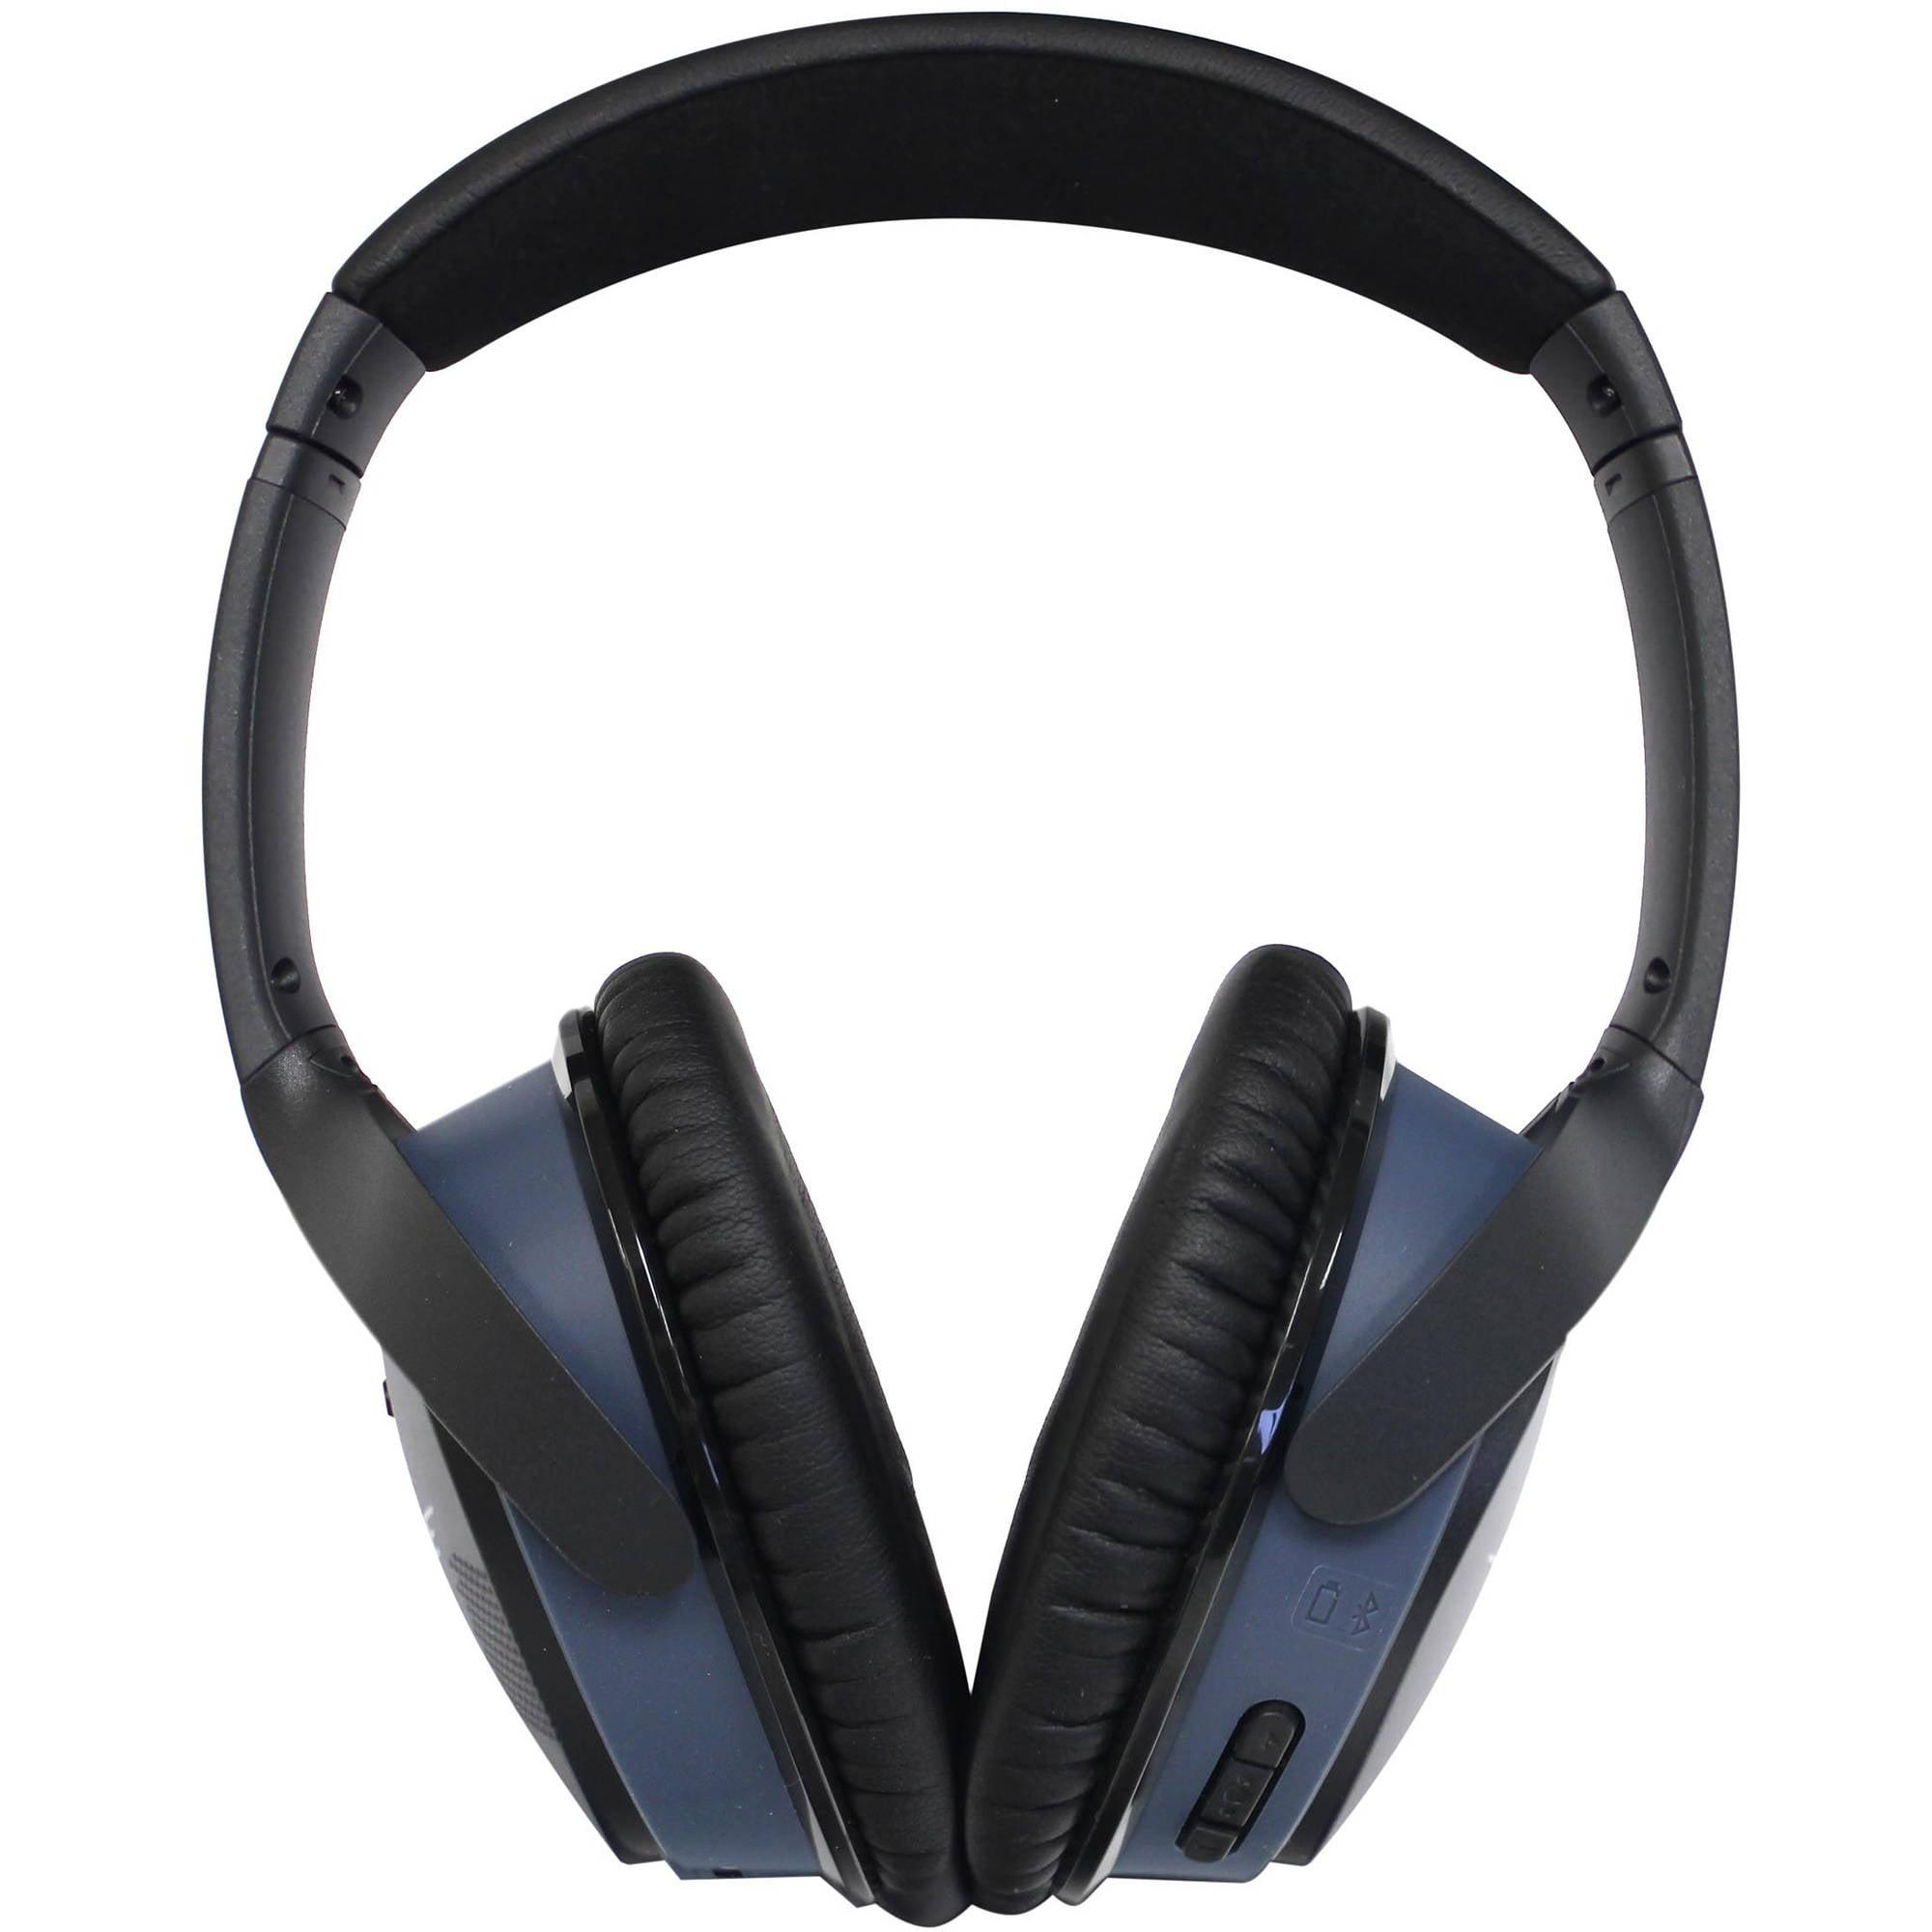 Bose SoundLink AE II Wireless Headphones